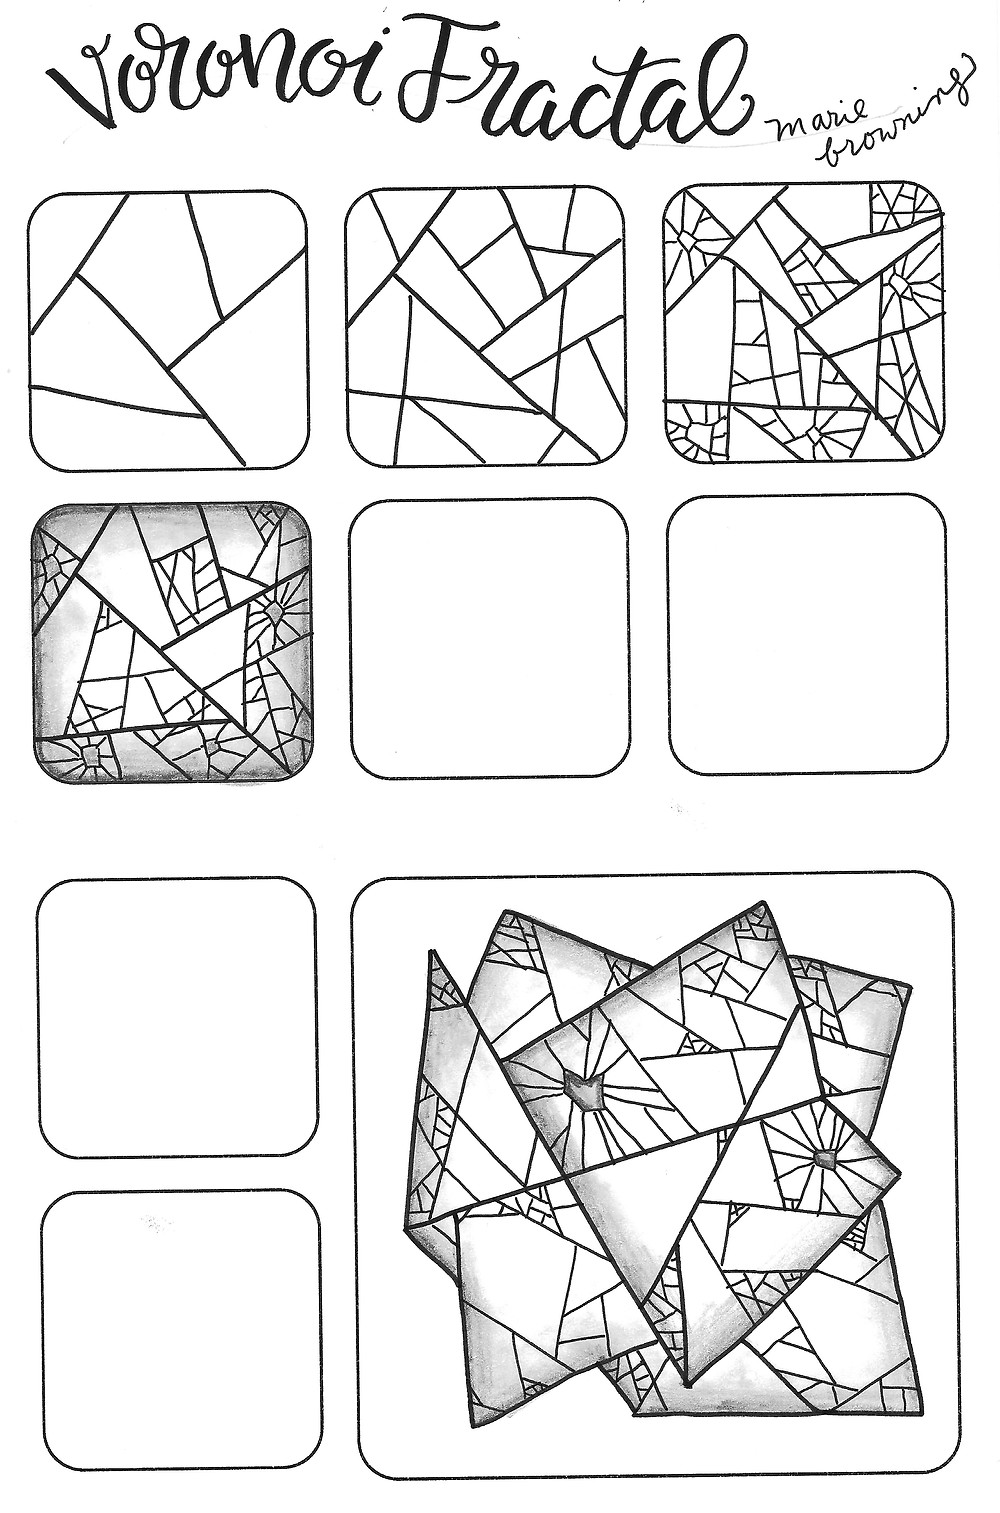 @mariebcreates voronoi fractal #monodrawingpens